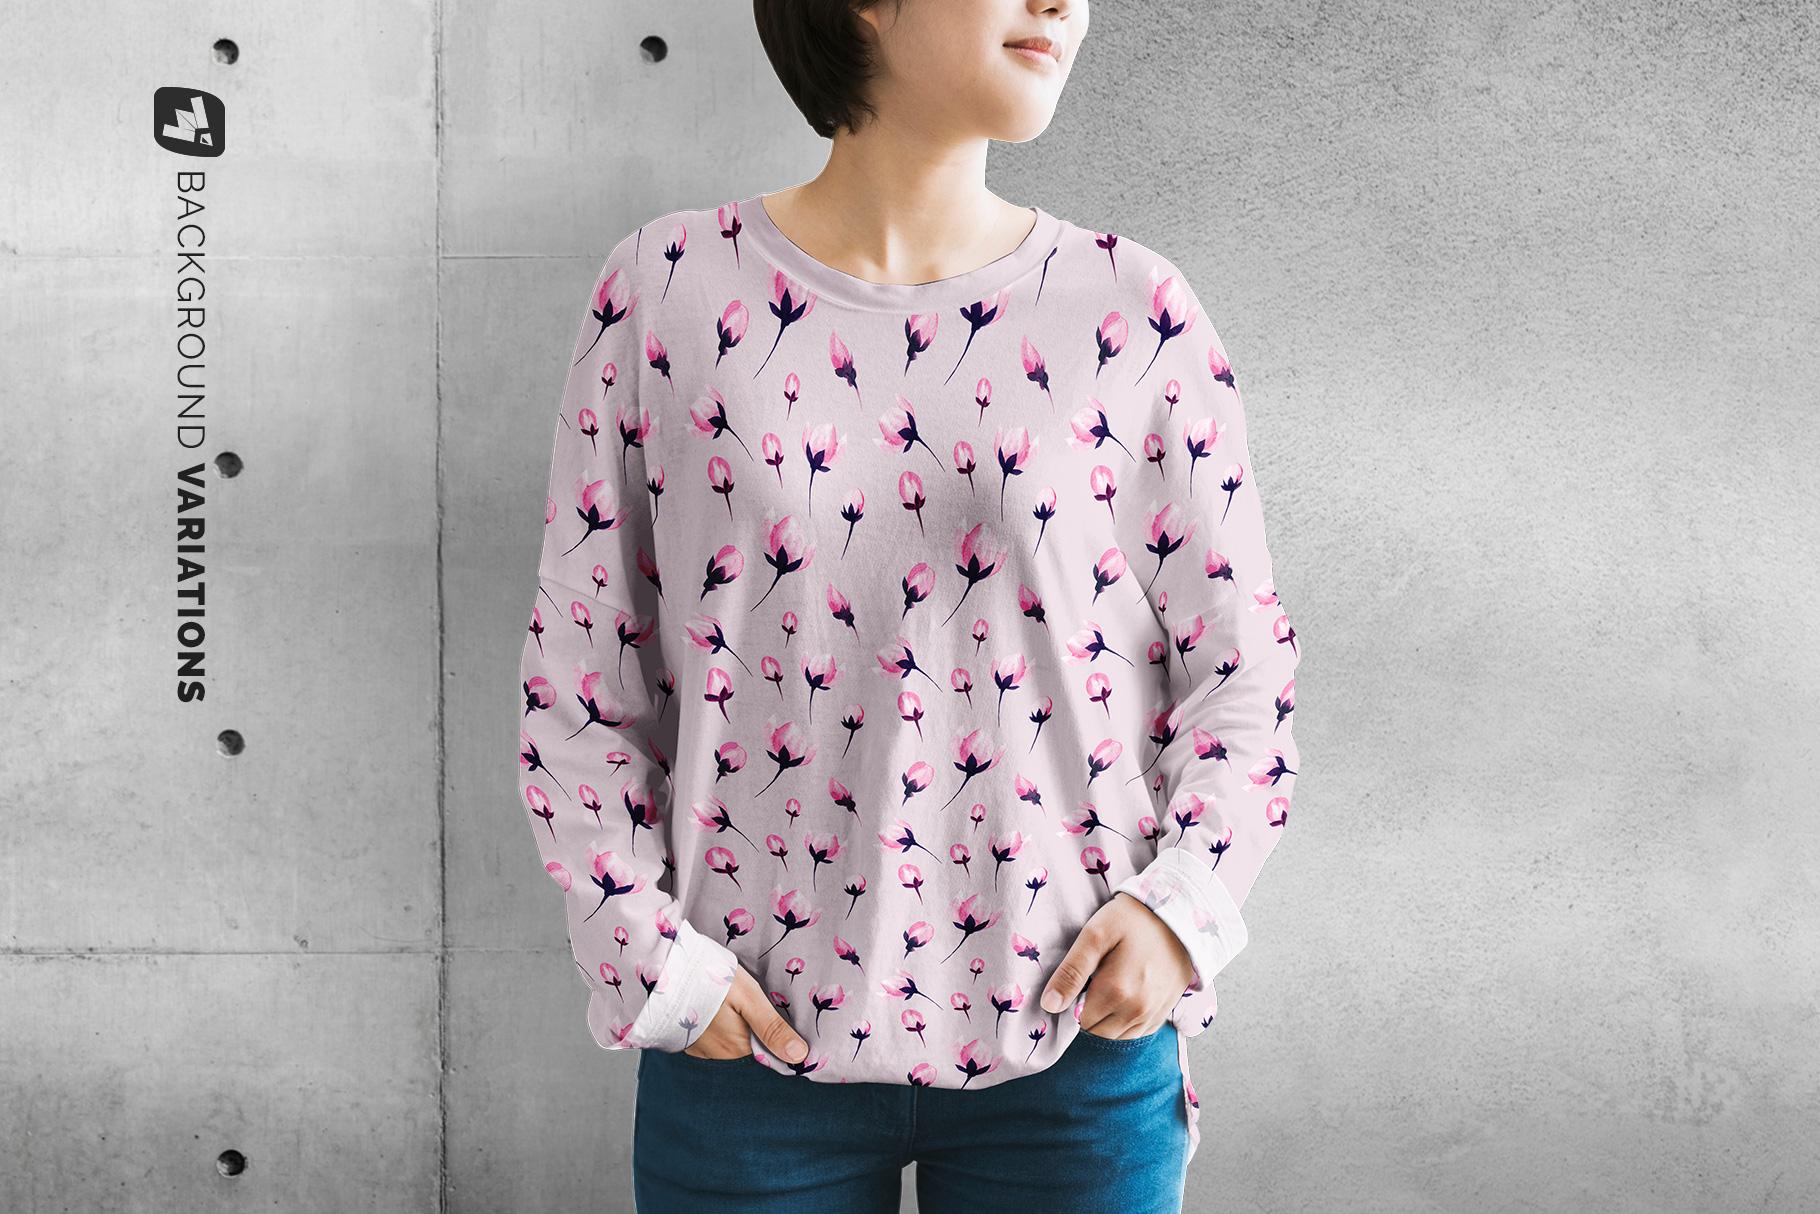 background options of the women's full sleeve tshirt mockup